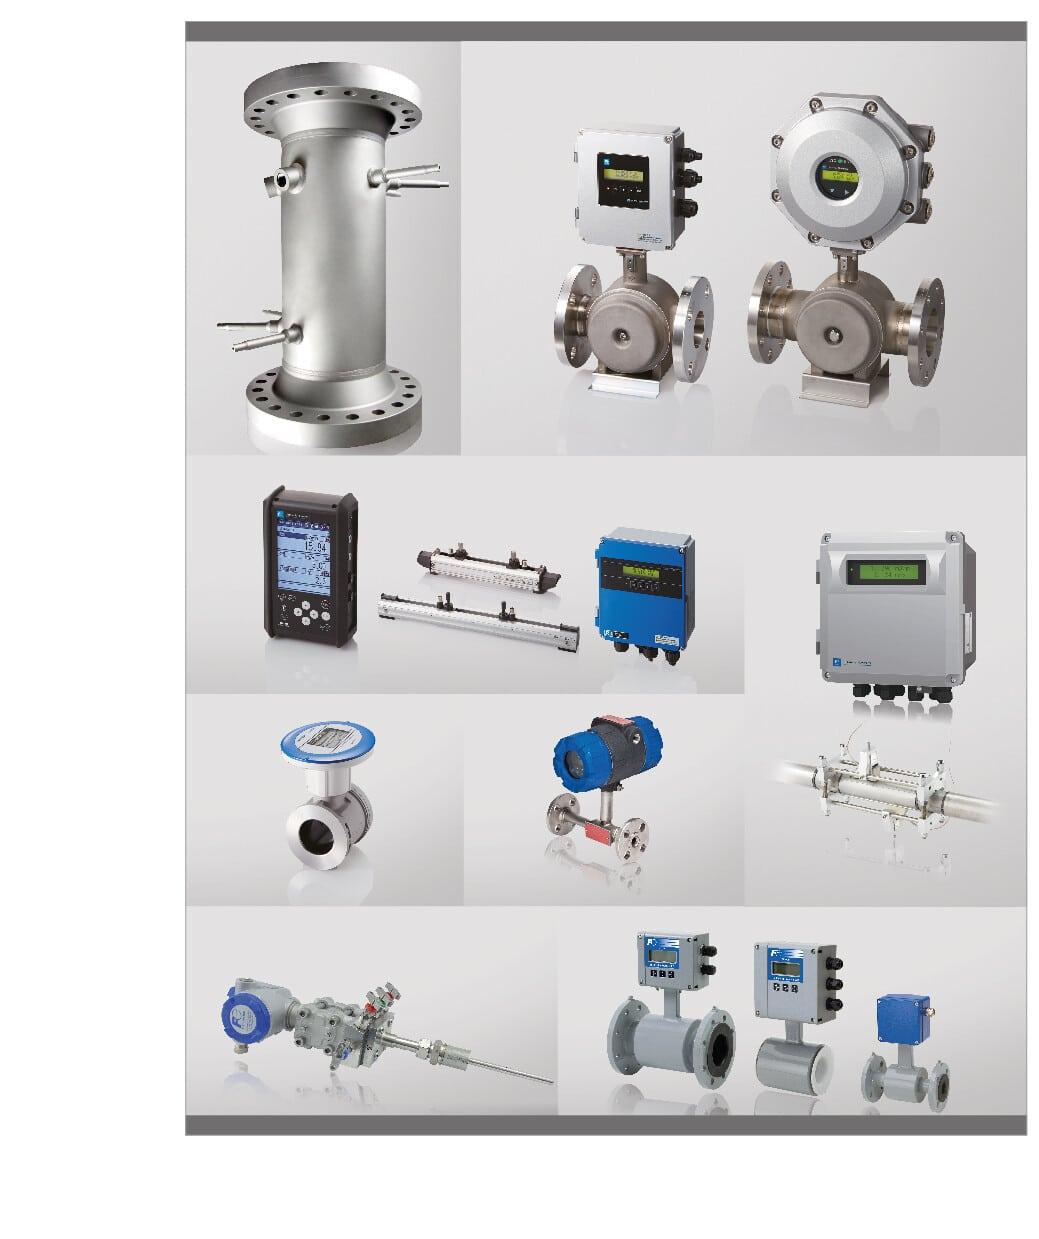 fuji-electric-flow-meters